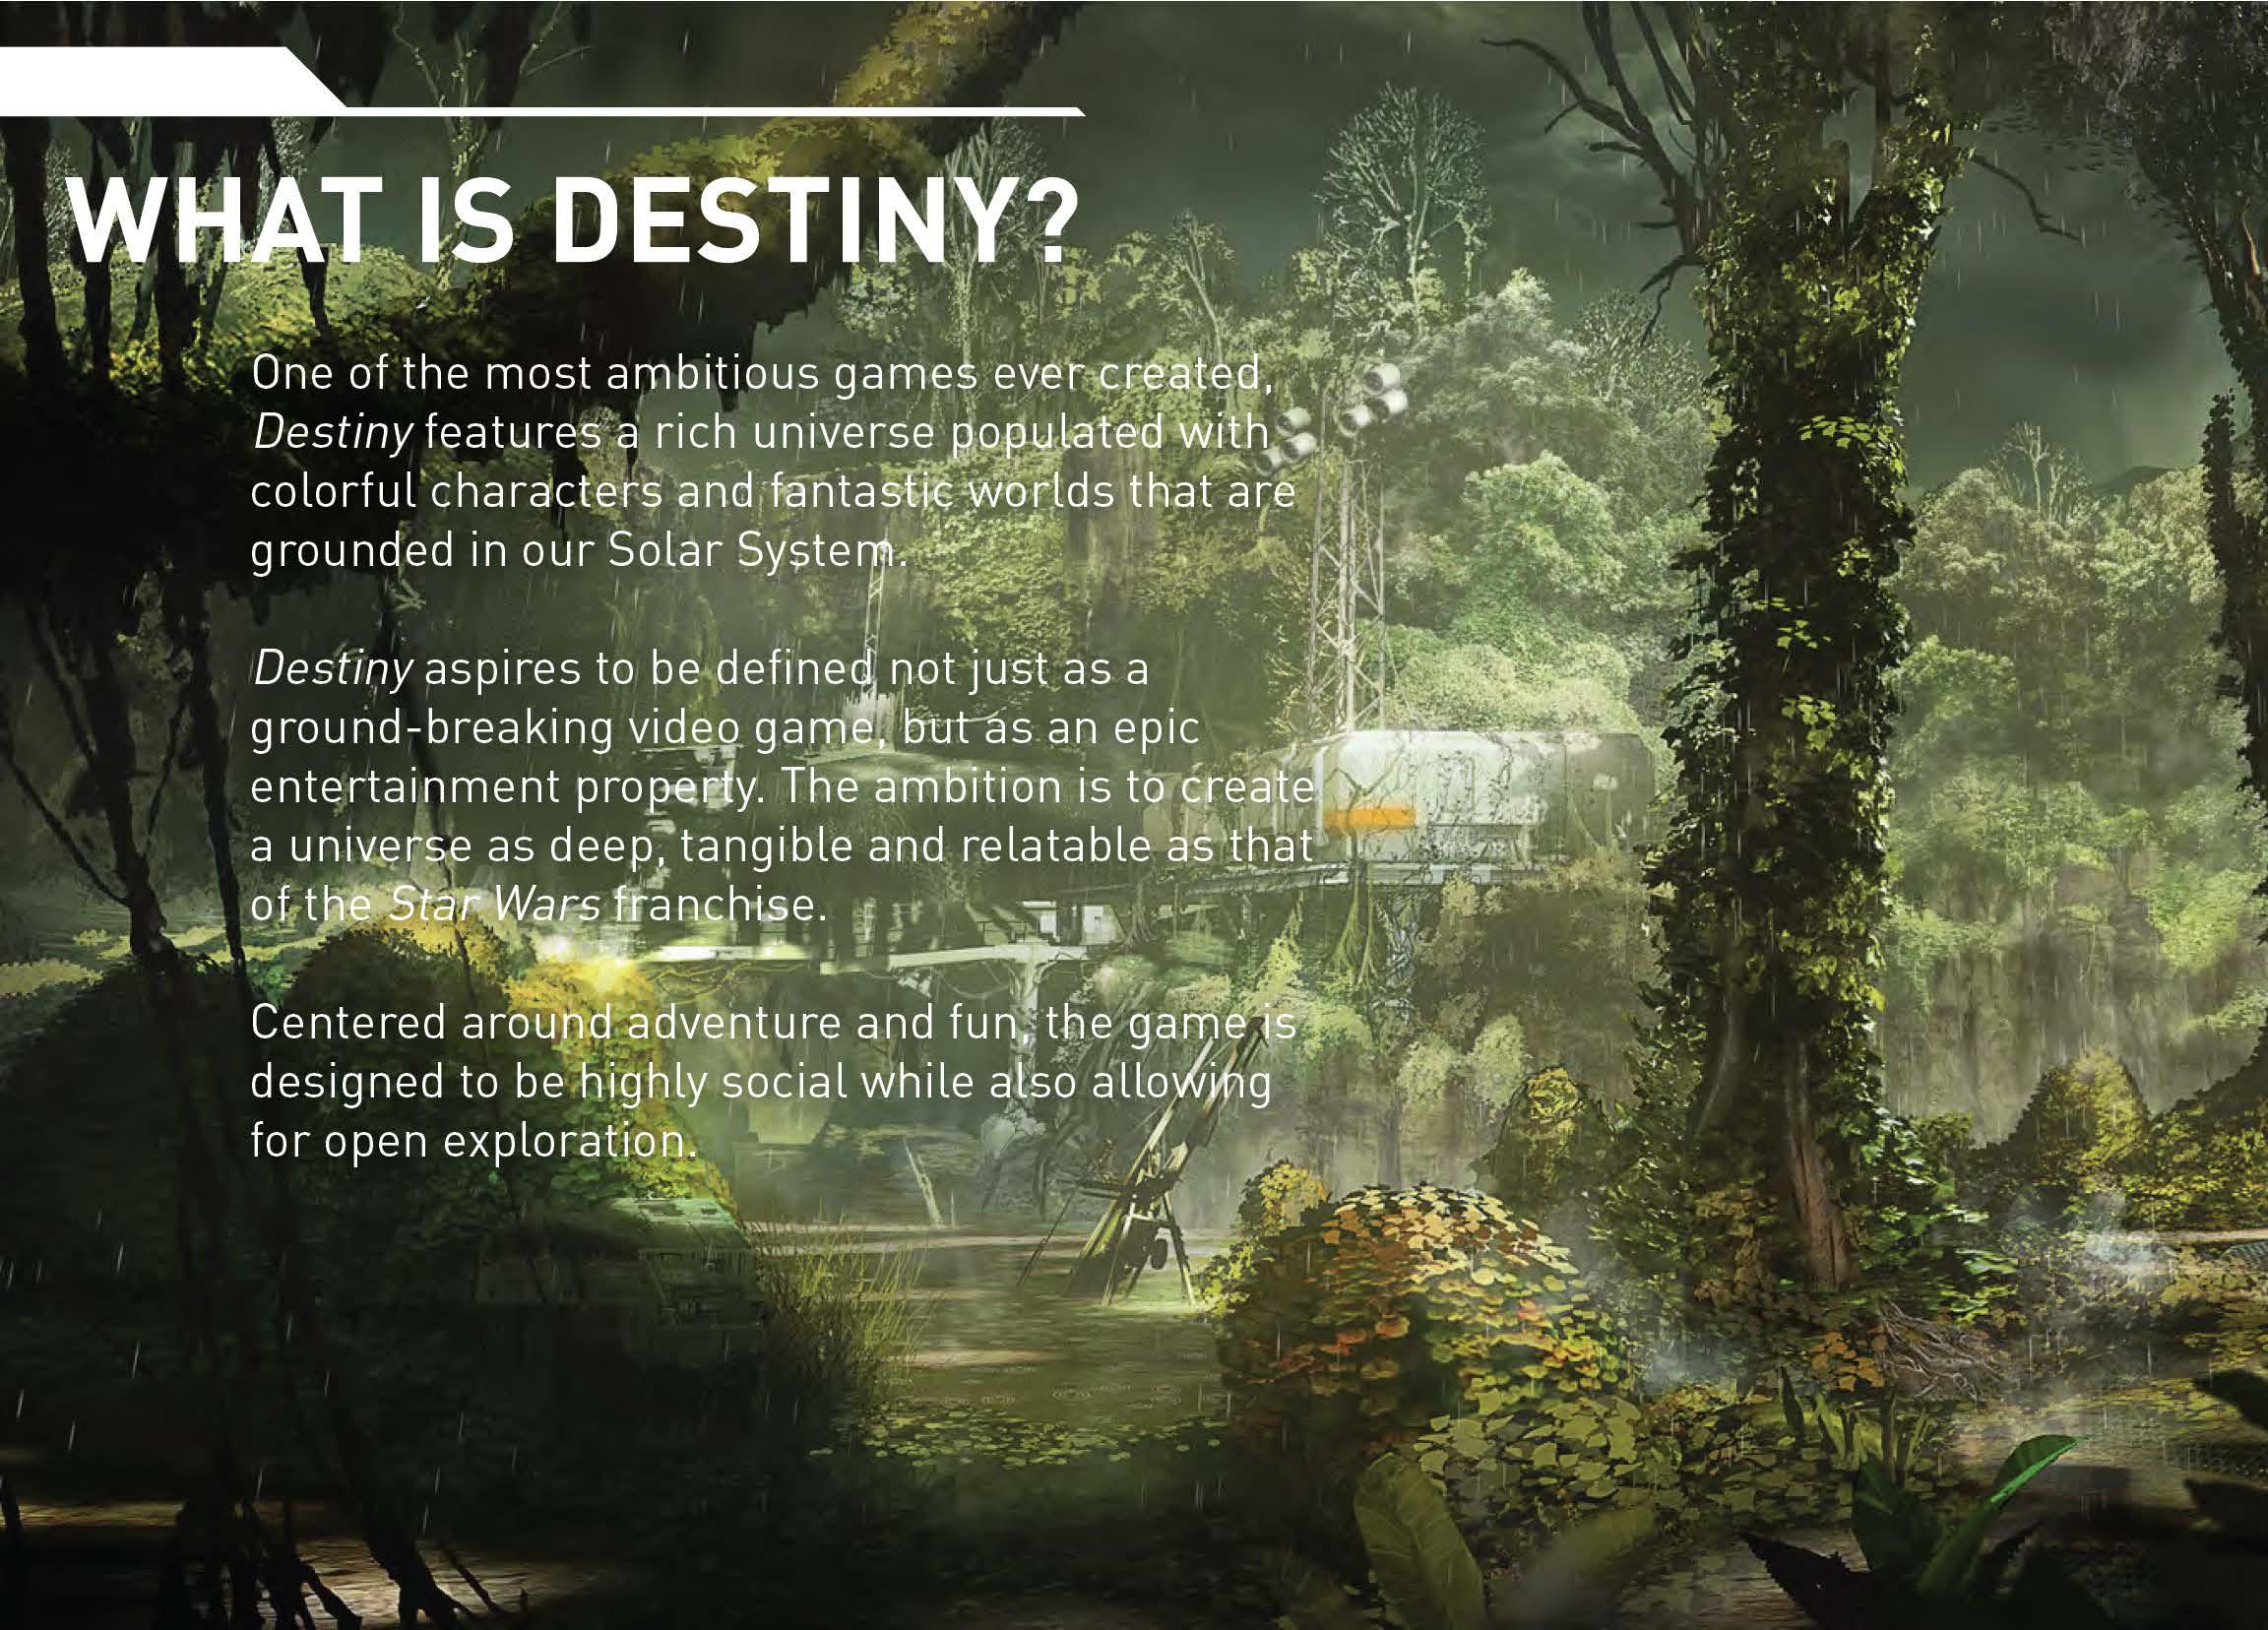 destiny quotes bungie - HD1362×876